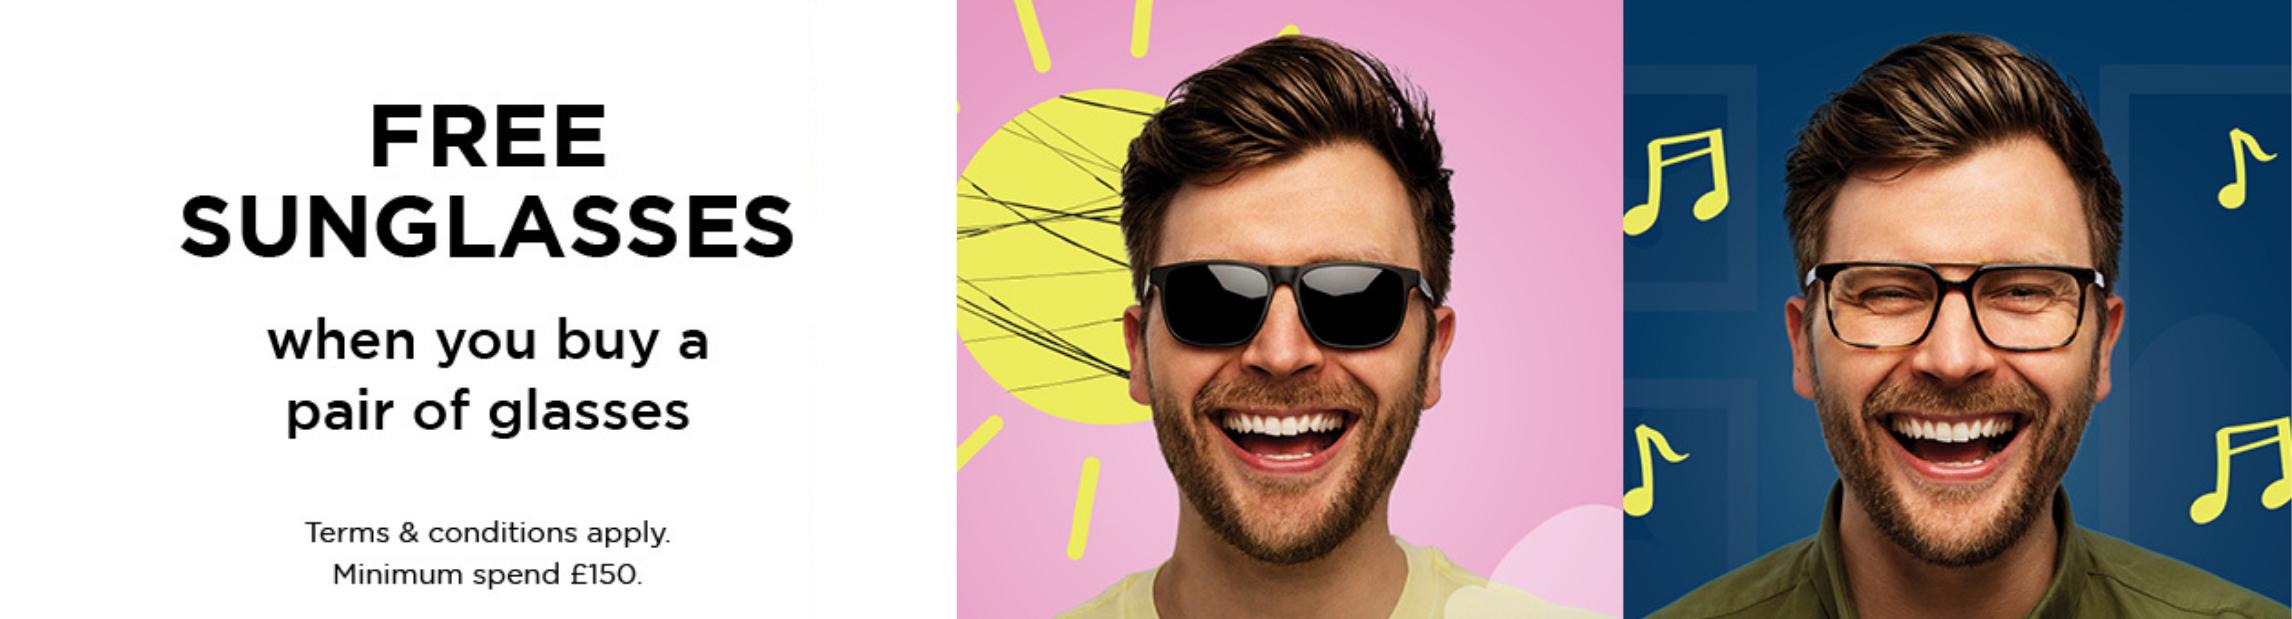 Offer-Header-Free-Sunglasses.png